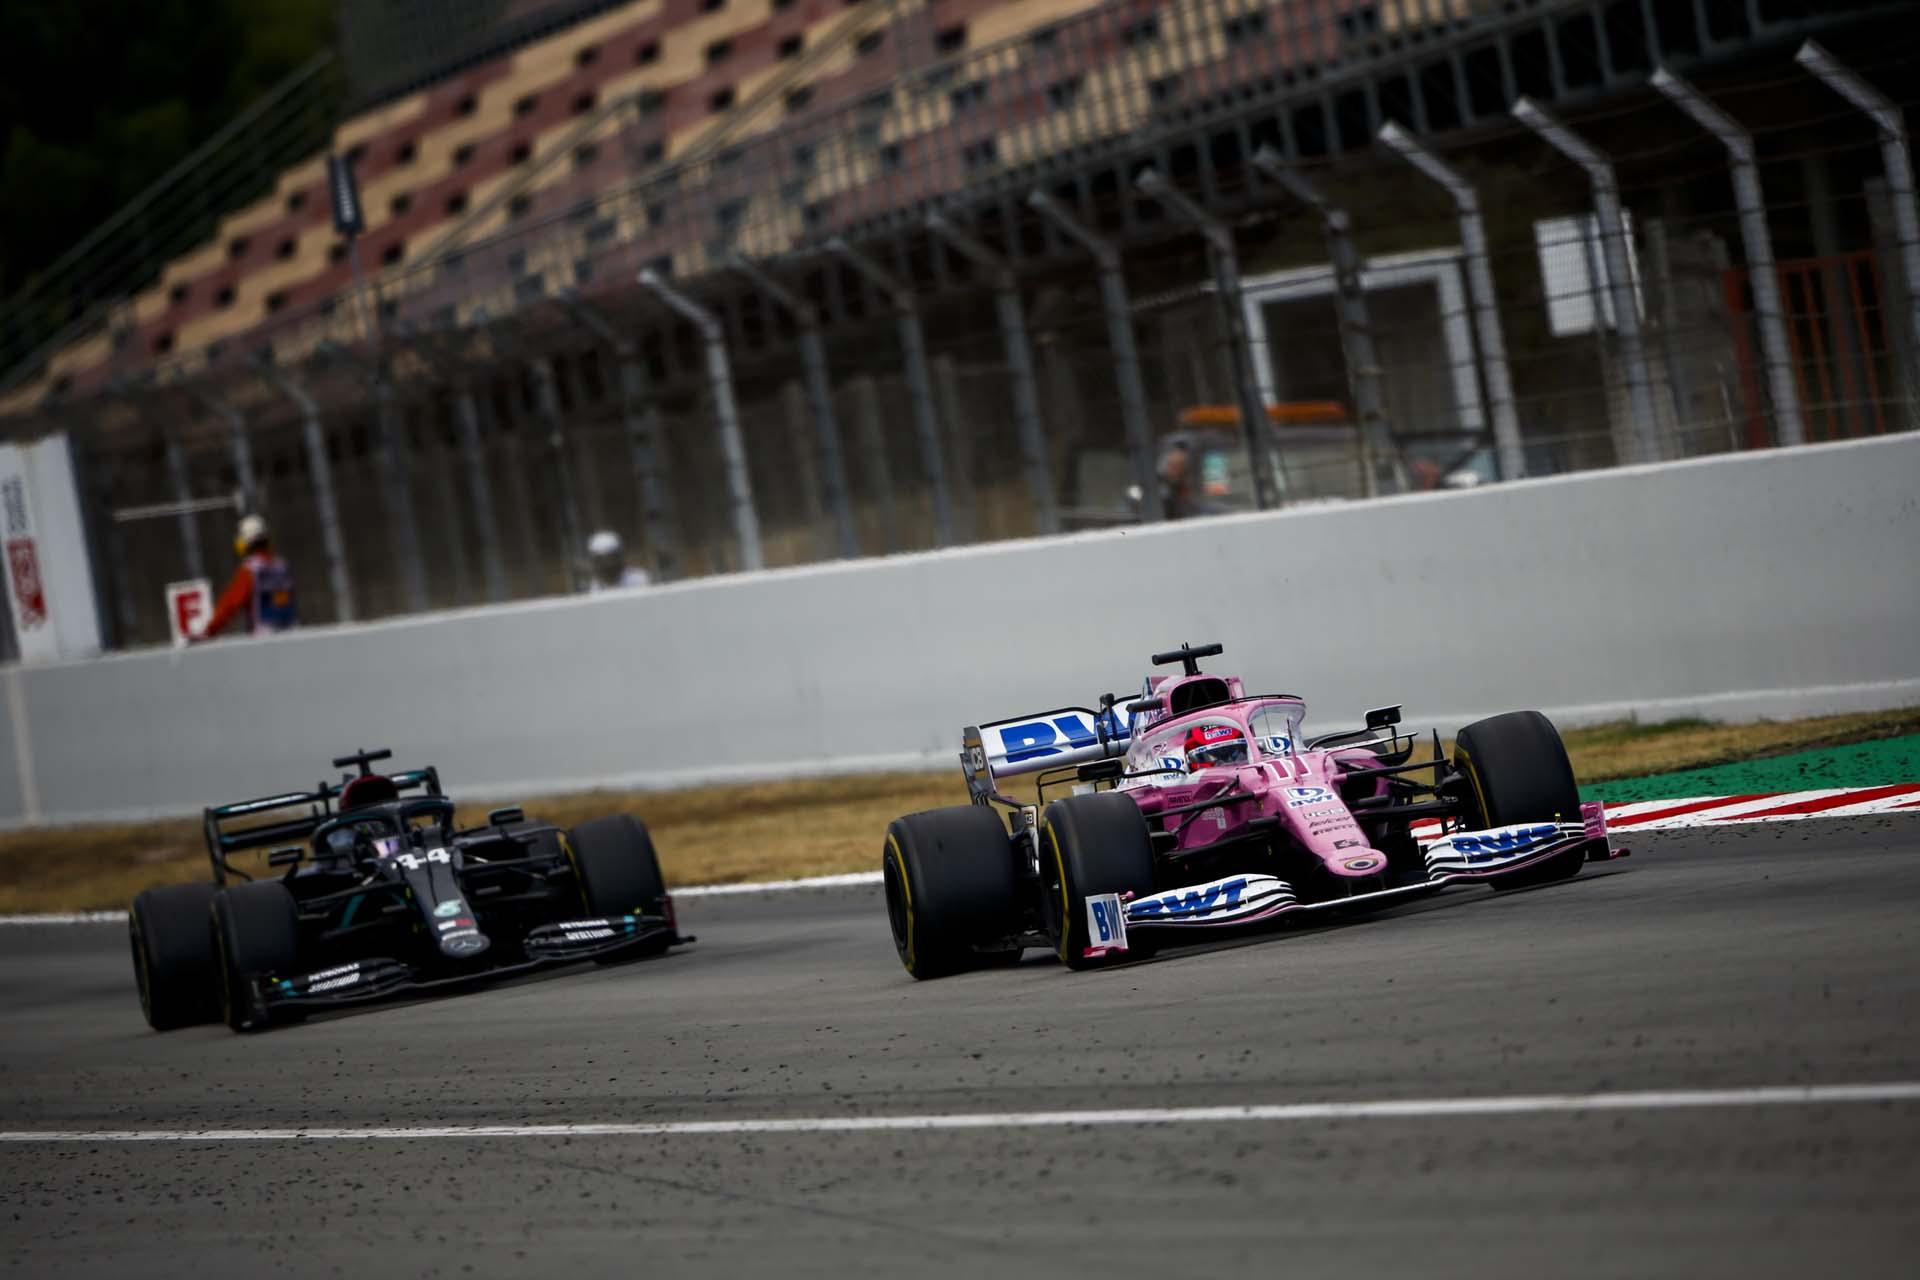 2020SpanishGPSunday_RacingP_GP2006_142050_ONY6132